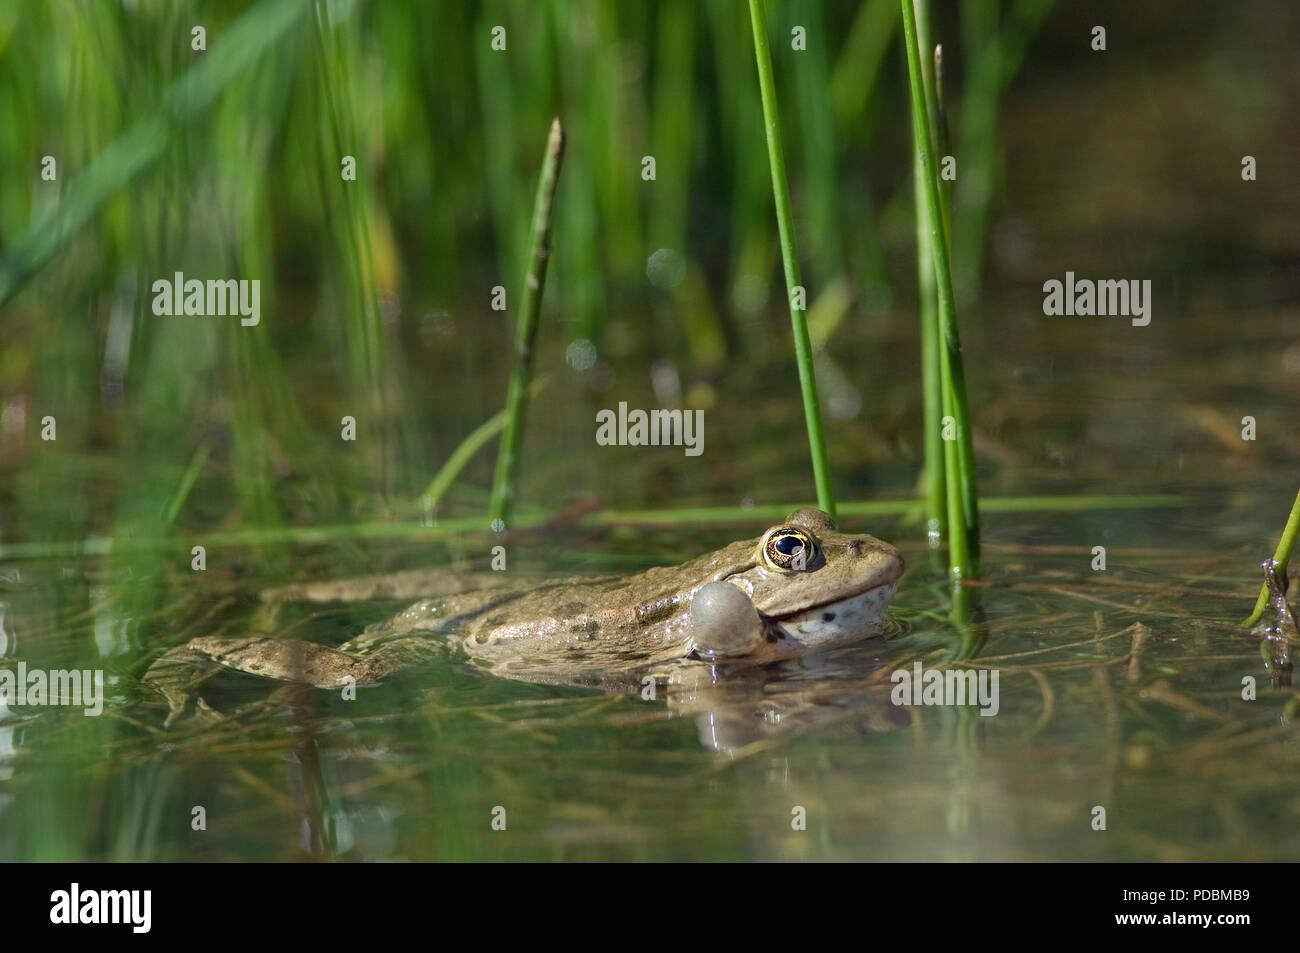 Grenouille de Lesson - sacs vocaux gonflés - Pool Frog - Vocal sacs inflated - Rana lessonae - Stock Image